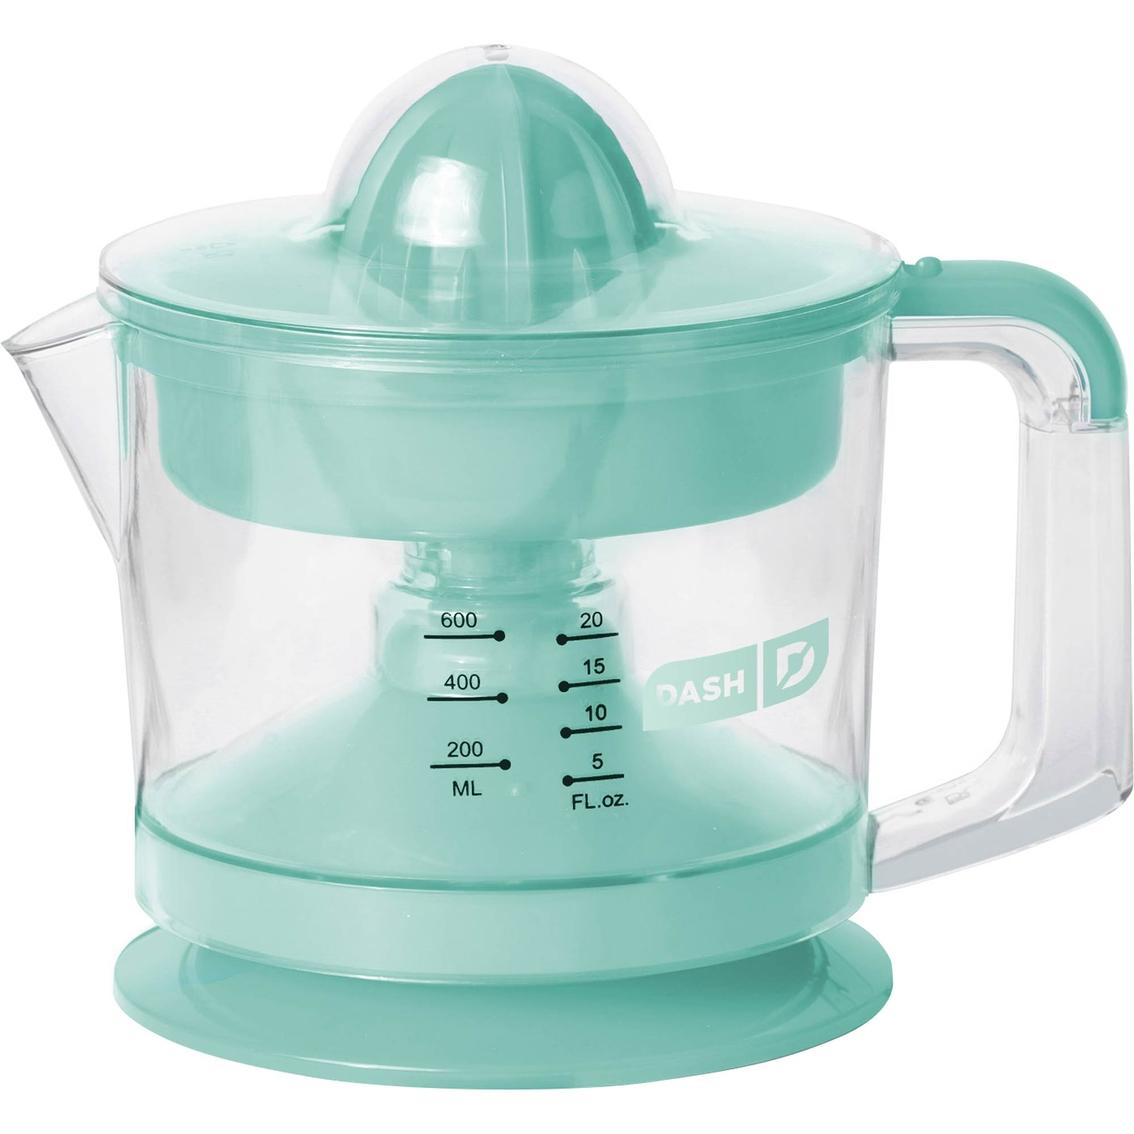 dash kitchen appliances moen brushed nickel faucet go dual citrus juicer juicers home and